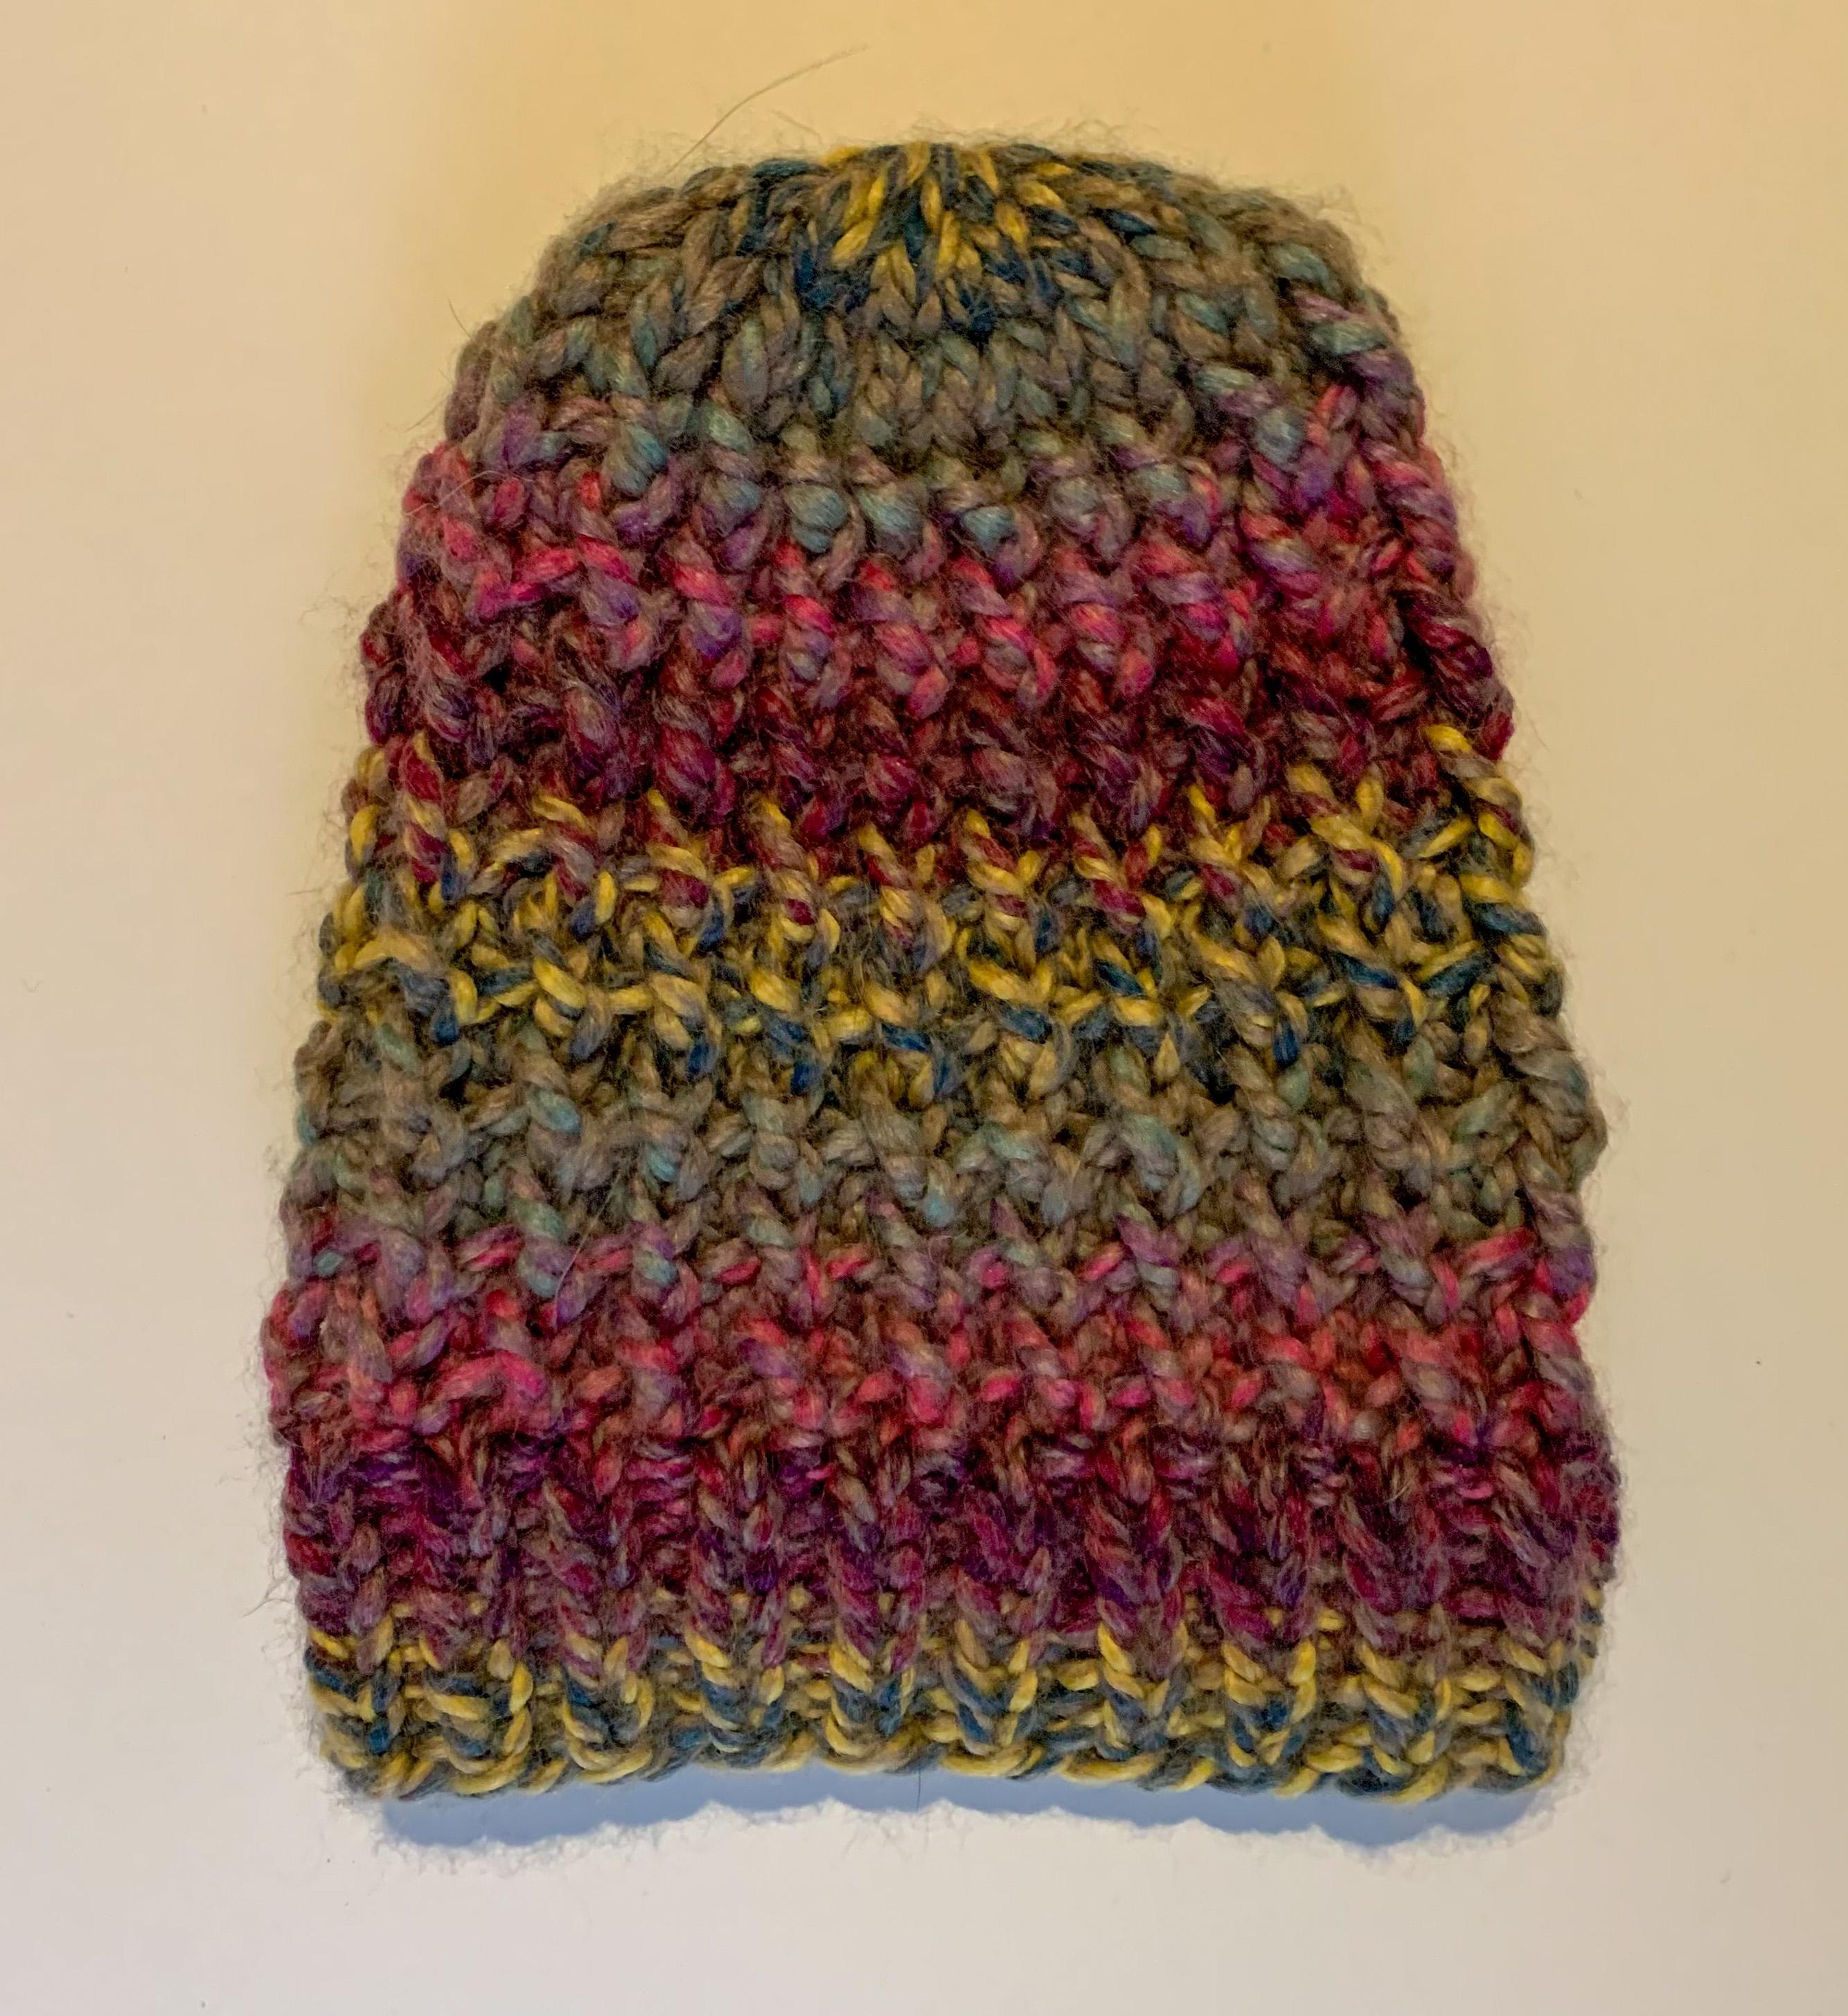 Multi-colored Knit Beanie